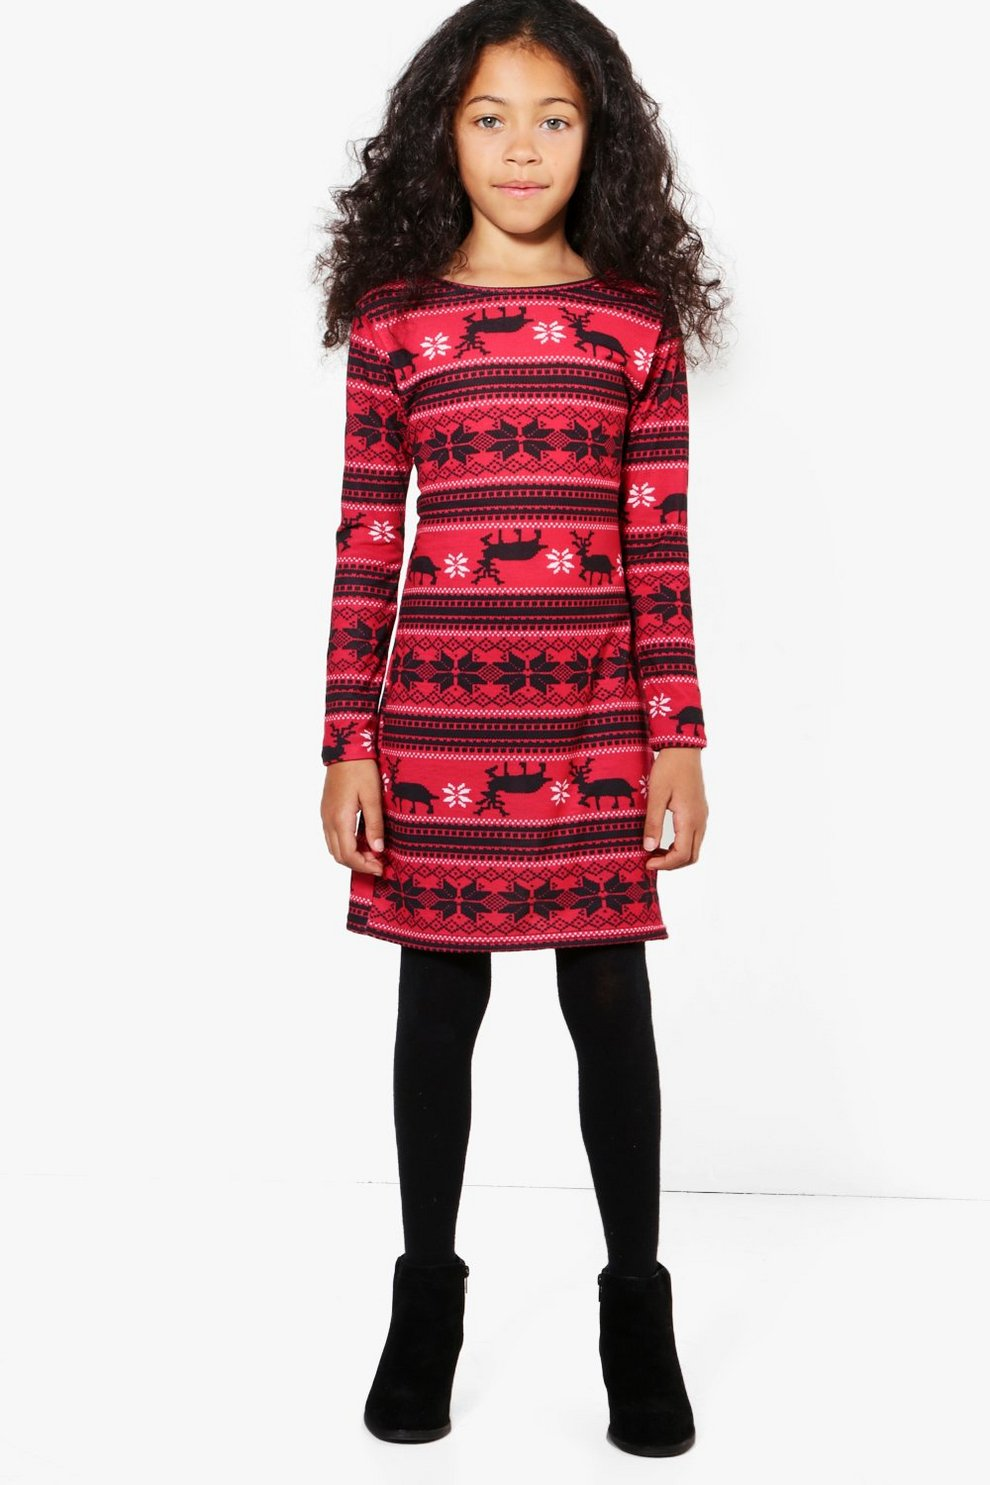 Girls Fairisle Bodycon Dress | Boohoo